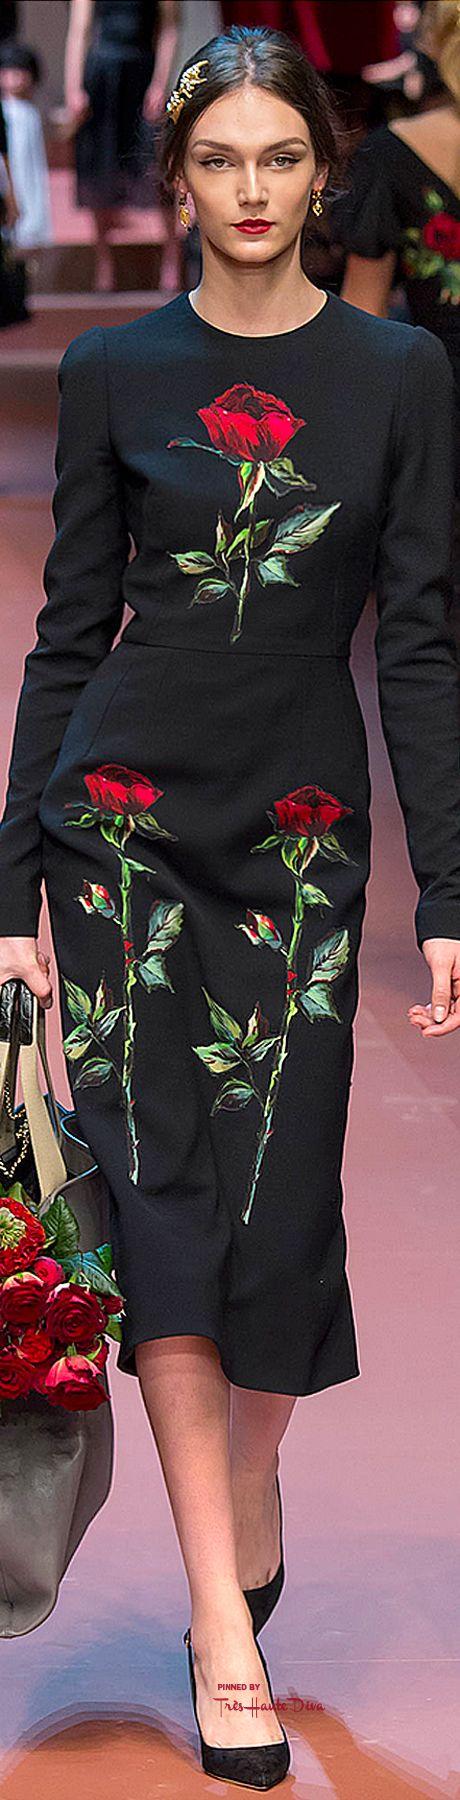 ♡Dolce & Gabbana Ready-to-Wear #MFW Fall 2015